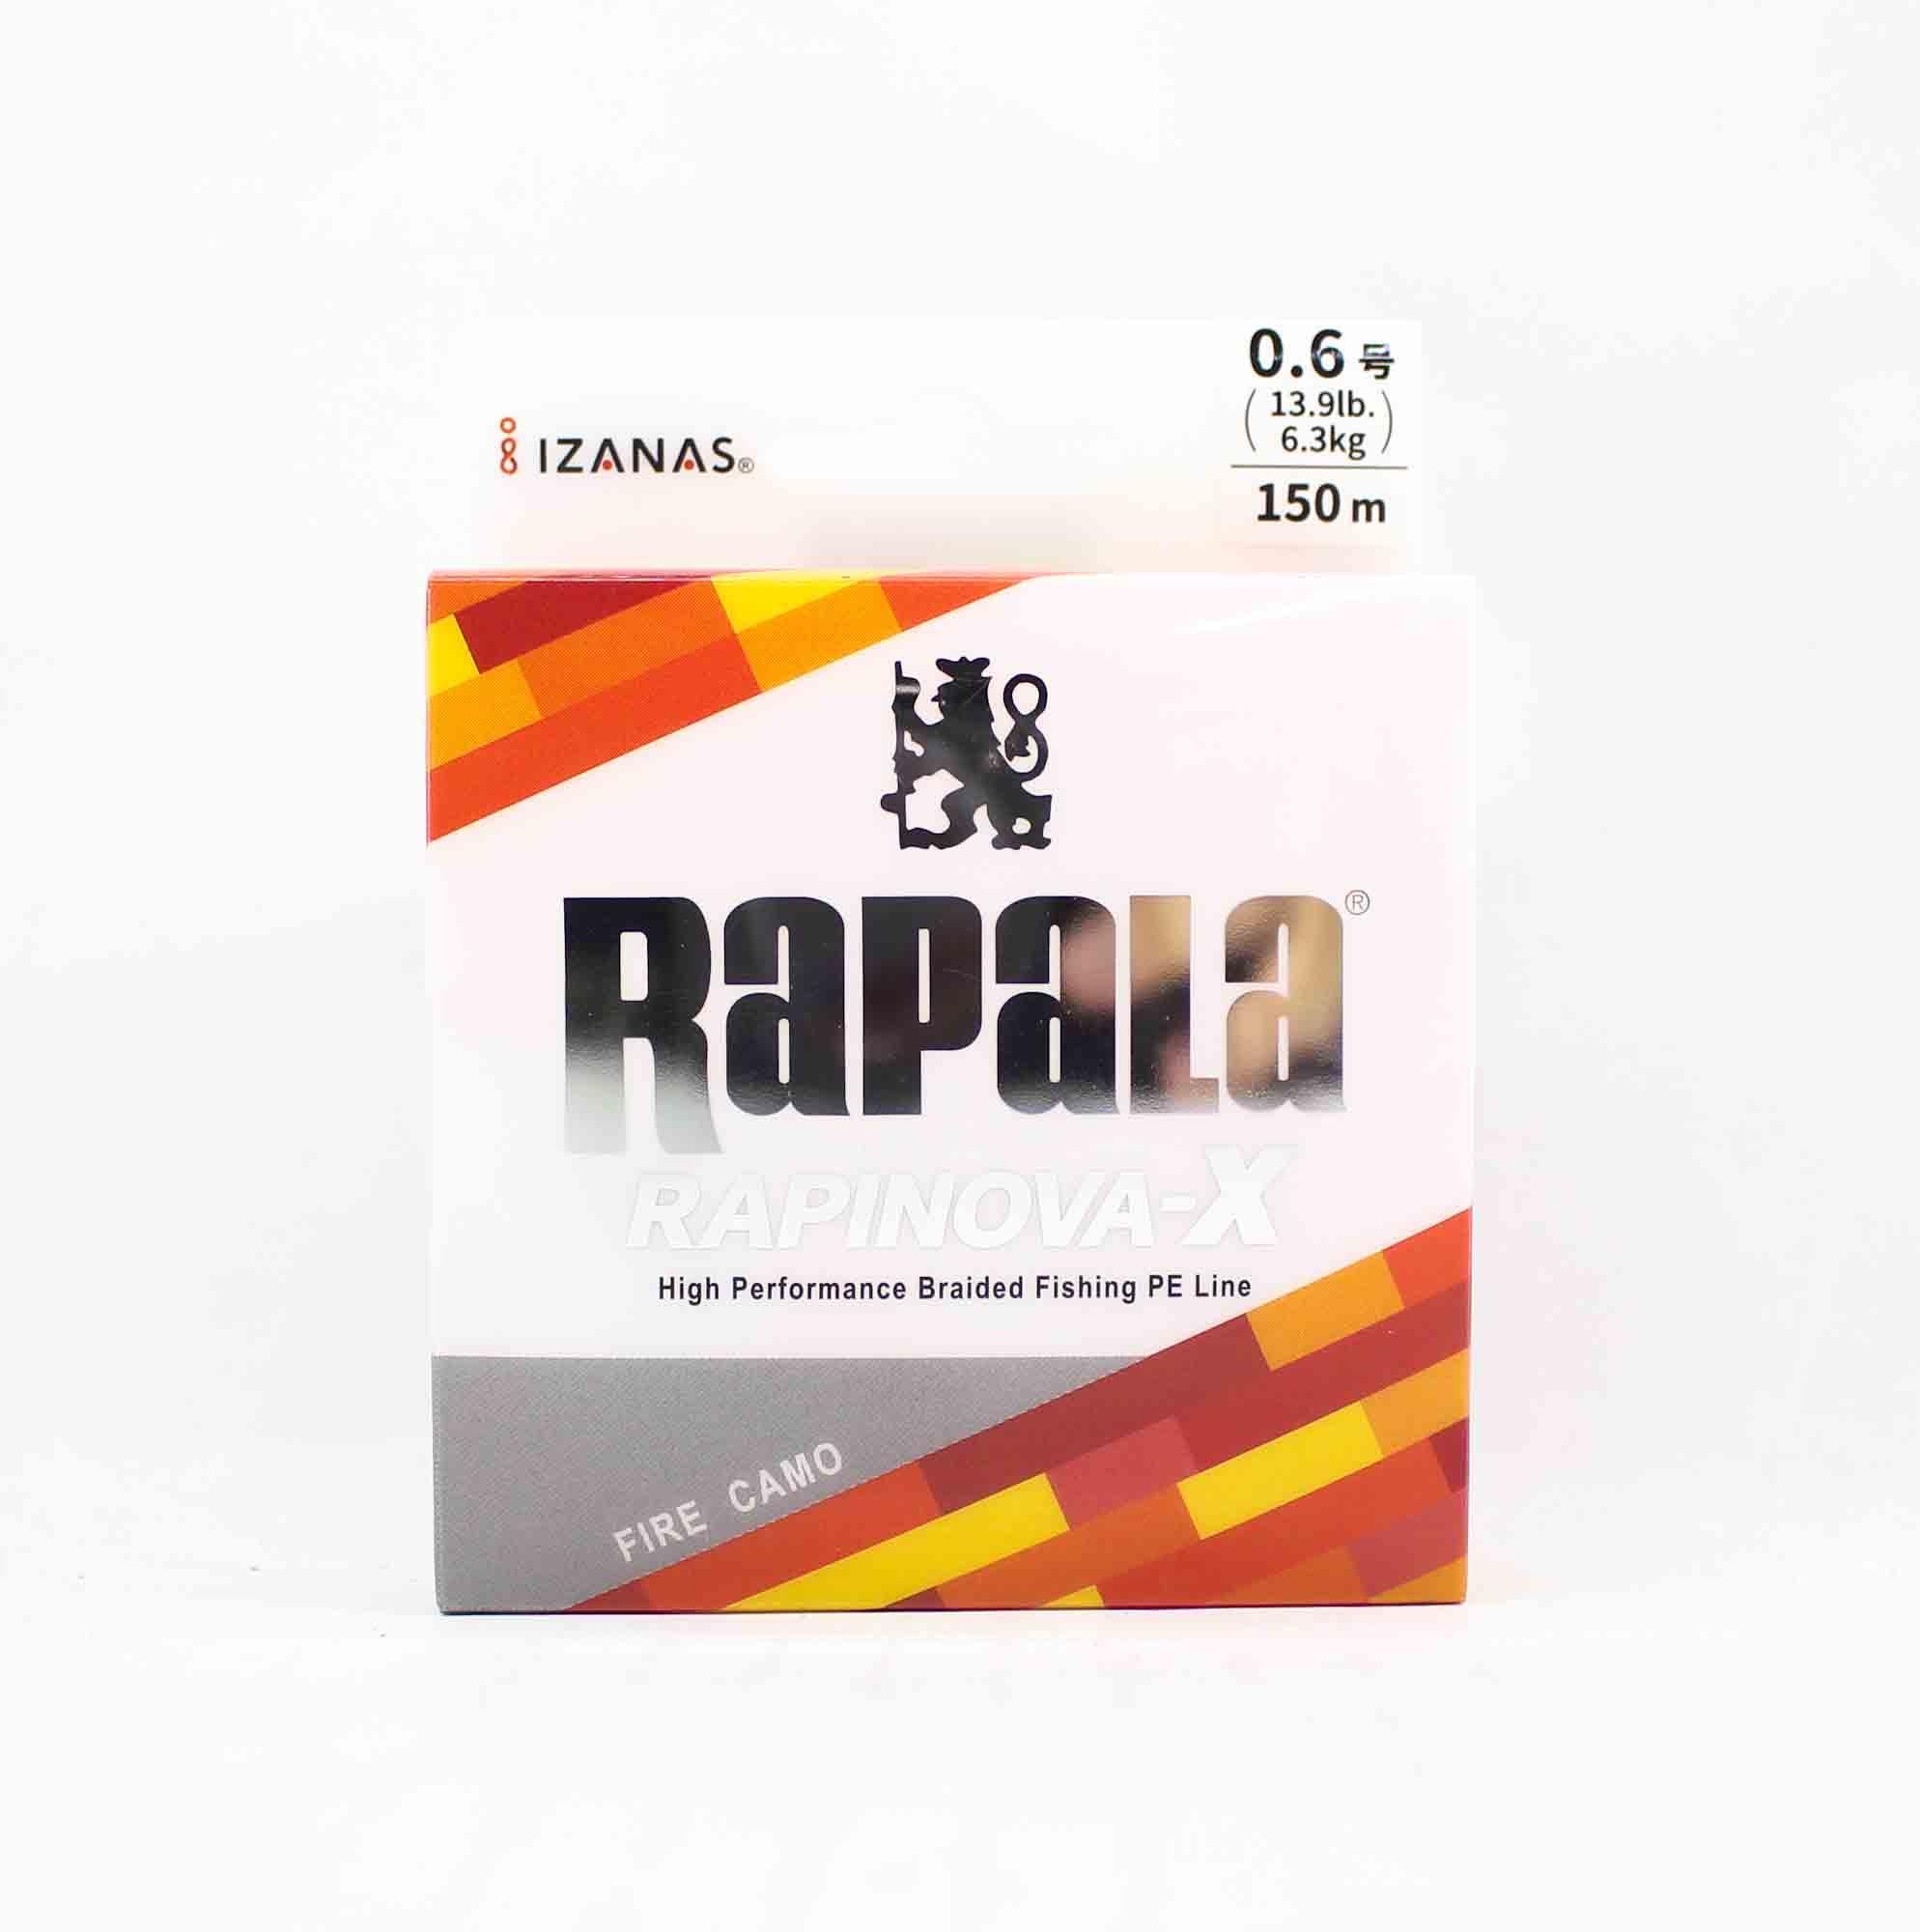 Rapala Rapinova-X Multi Game P.E 0.6 Line 150M 13.9lb Fire Camo (3567)